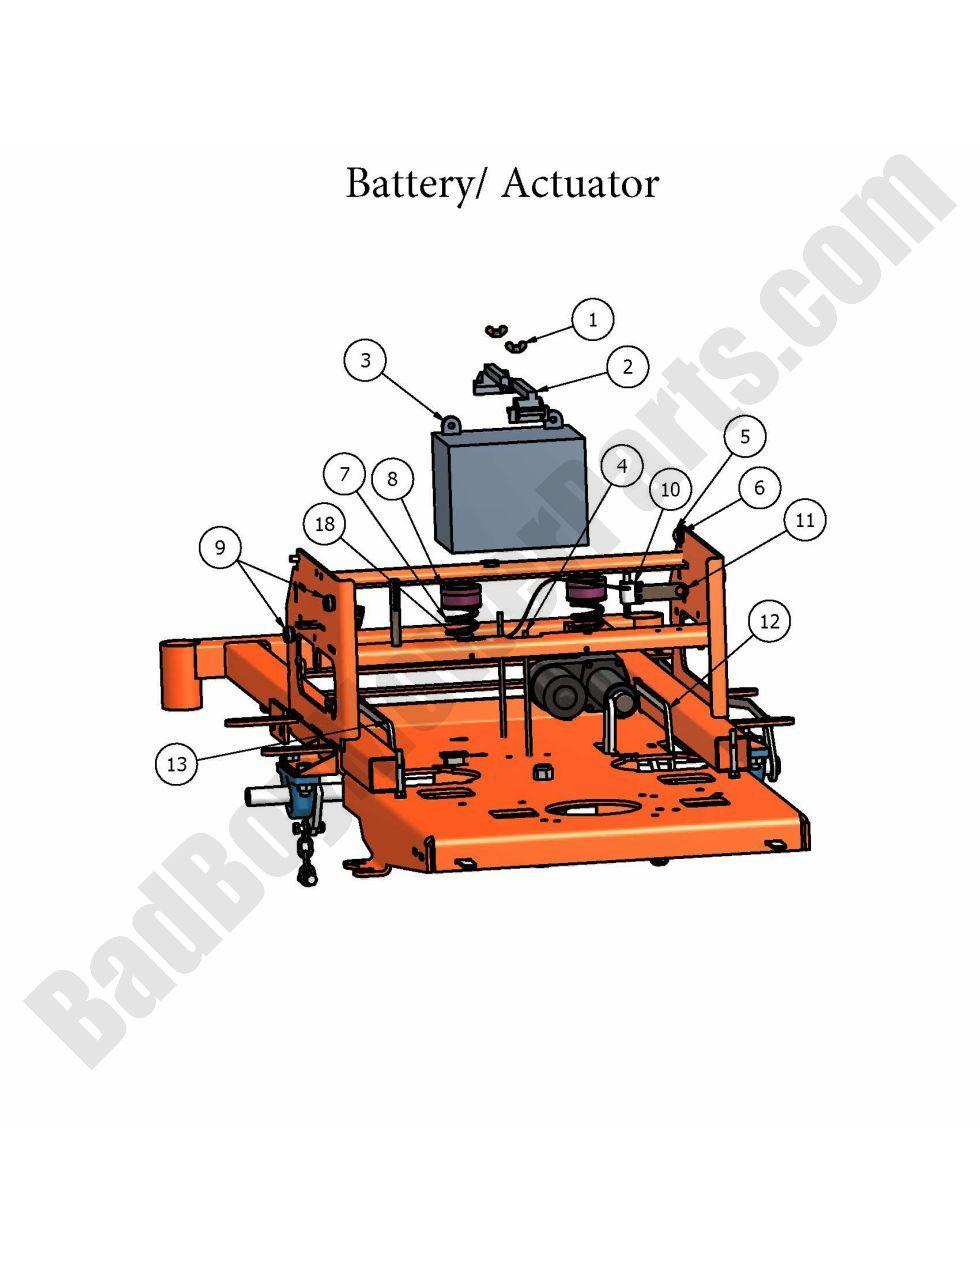 bad boy parts lookup 2007 zt battery actuator. Black Bedroom Furniture Sets. Home Design Ideas